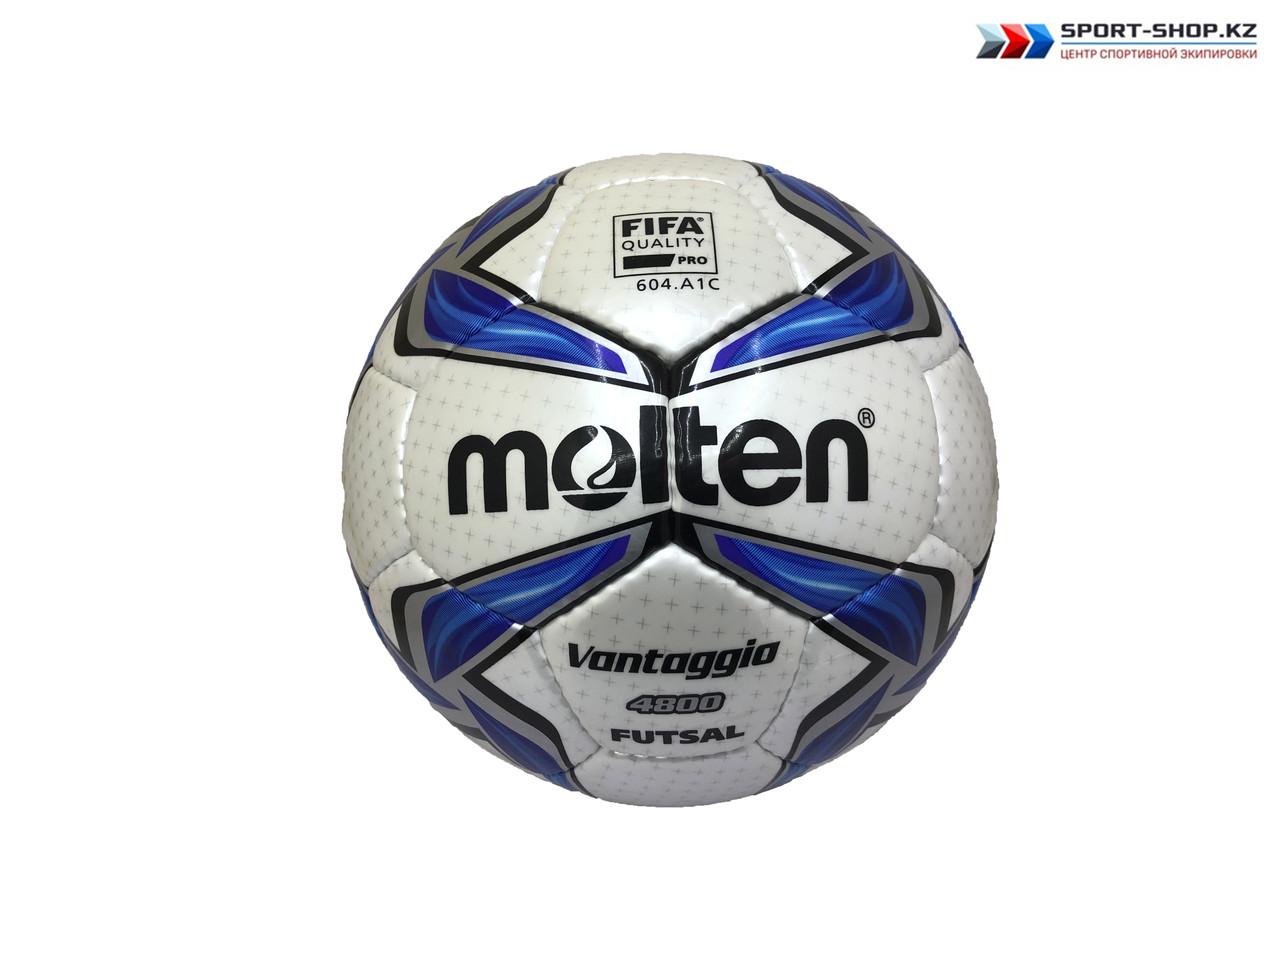 Мяч футзальный Molten vantaggio 4800 futsal original